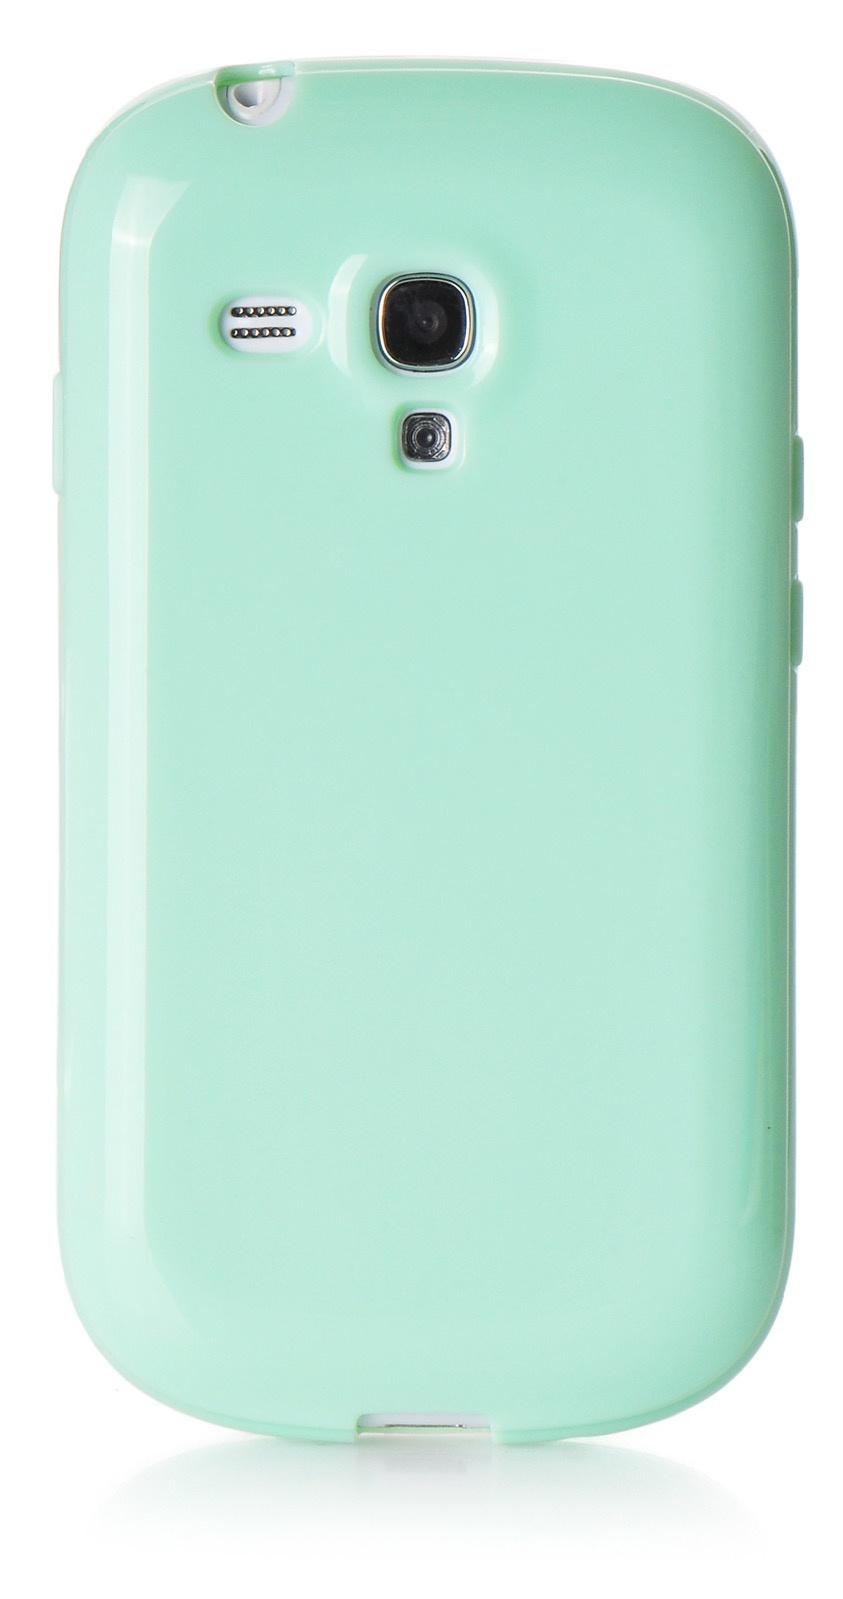 Чехол iNeez накладка силикон мыльница mint для Samsung Galaxy S3 mini,420024, мятный